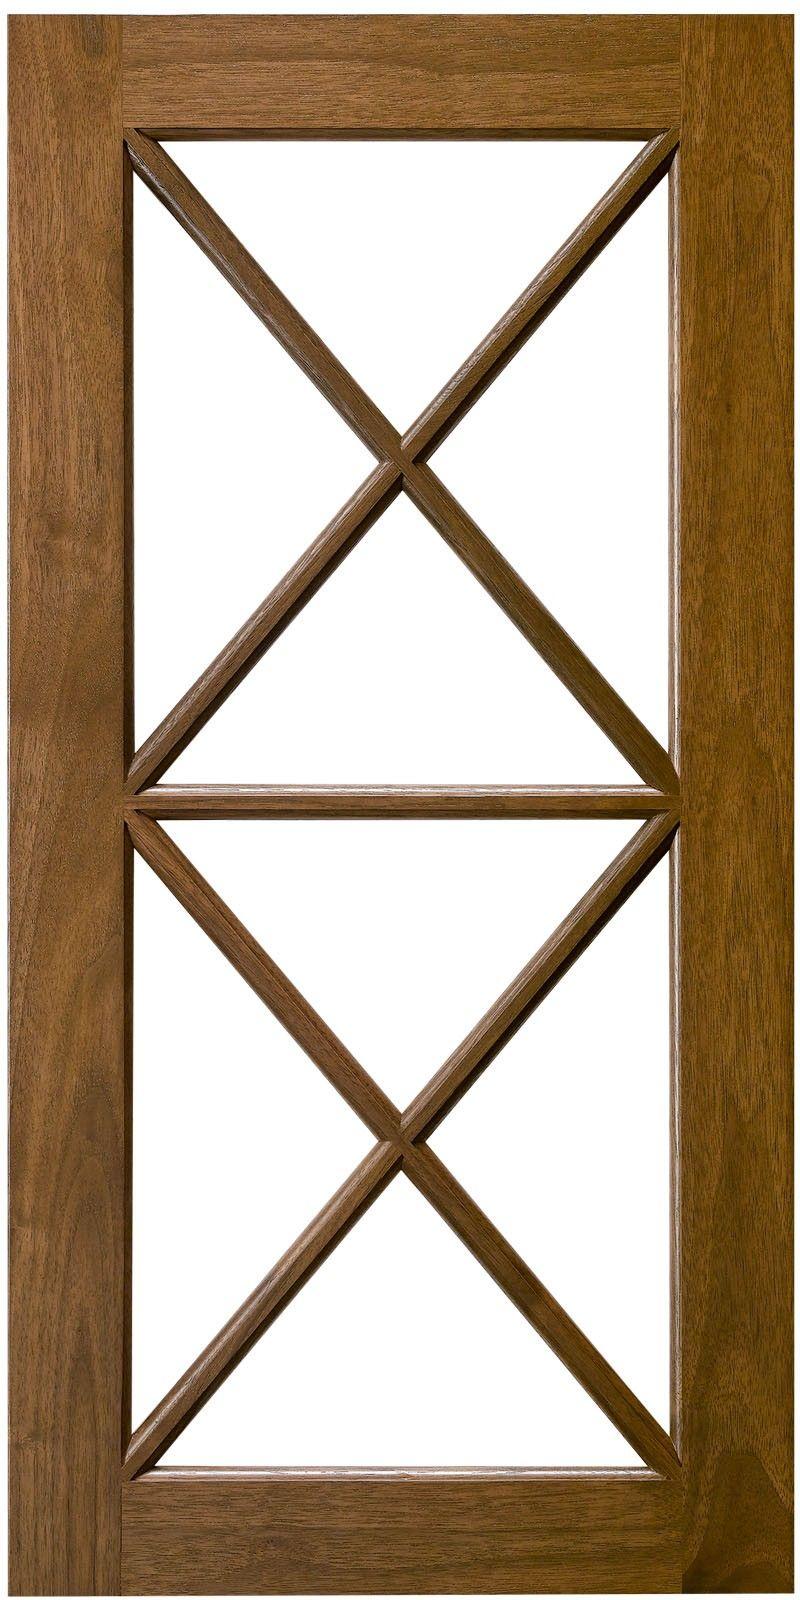 Double X Horizontal Mullion Cabinet Door Cabinet Doors Custom Cabinet Doors Doors